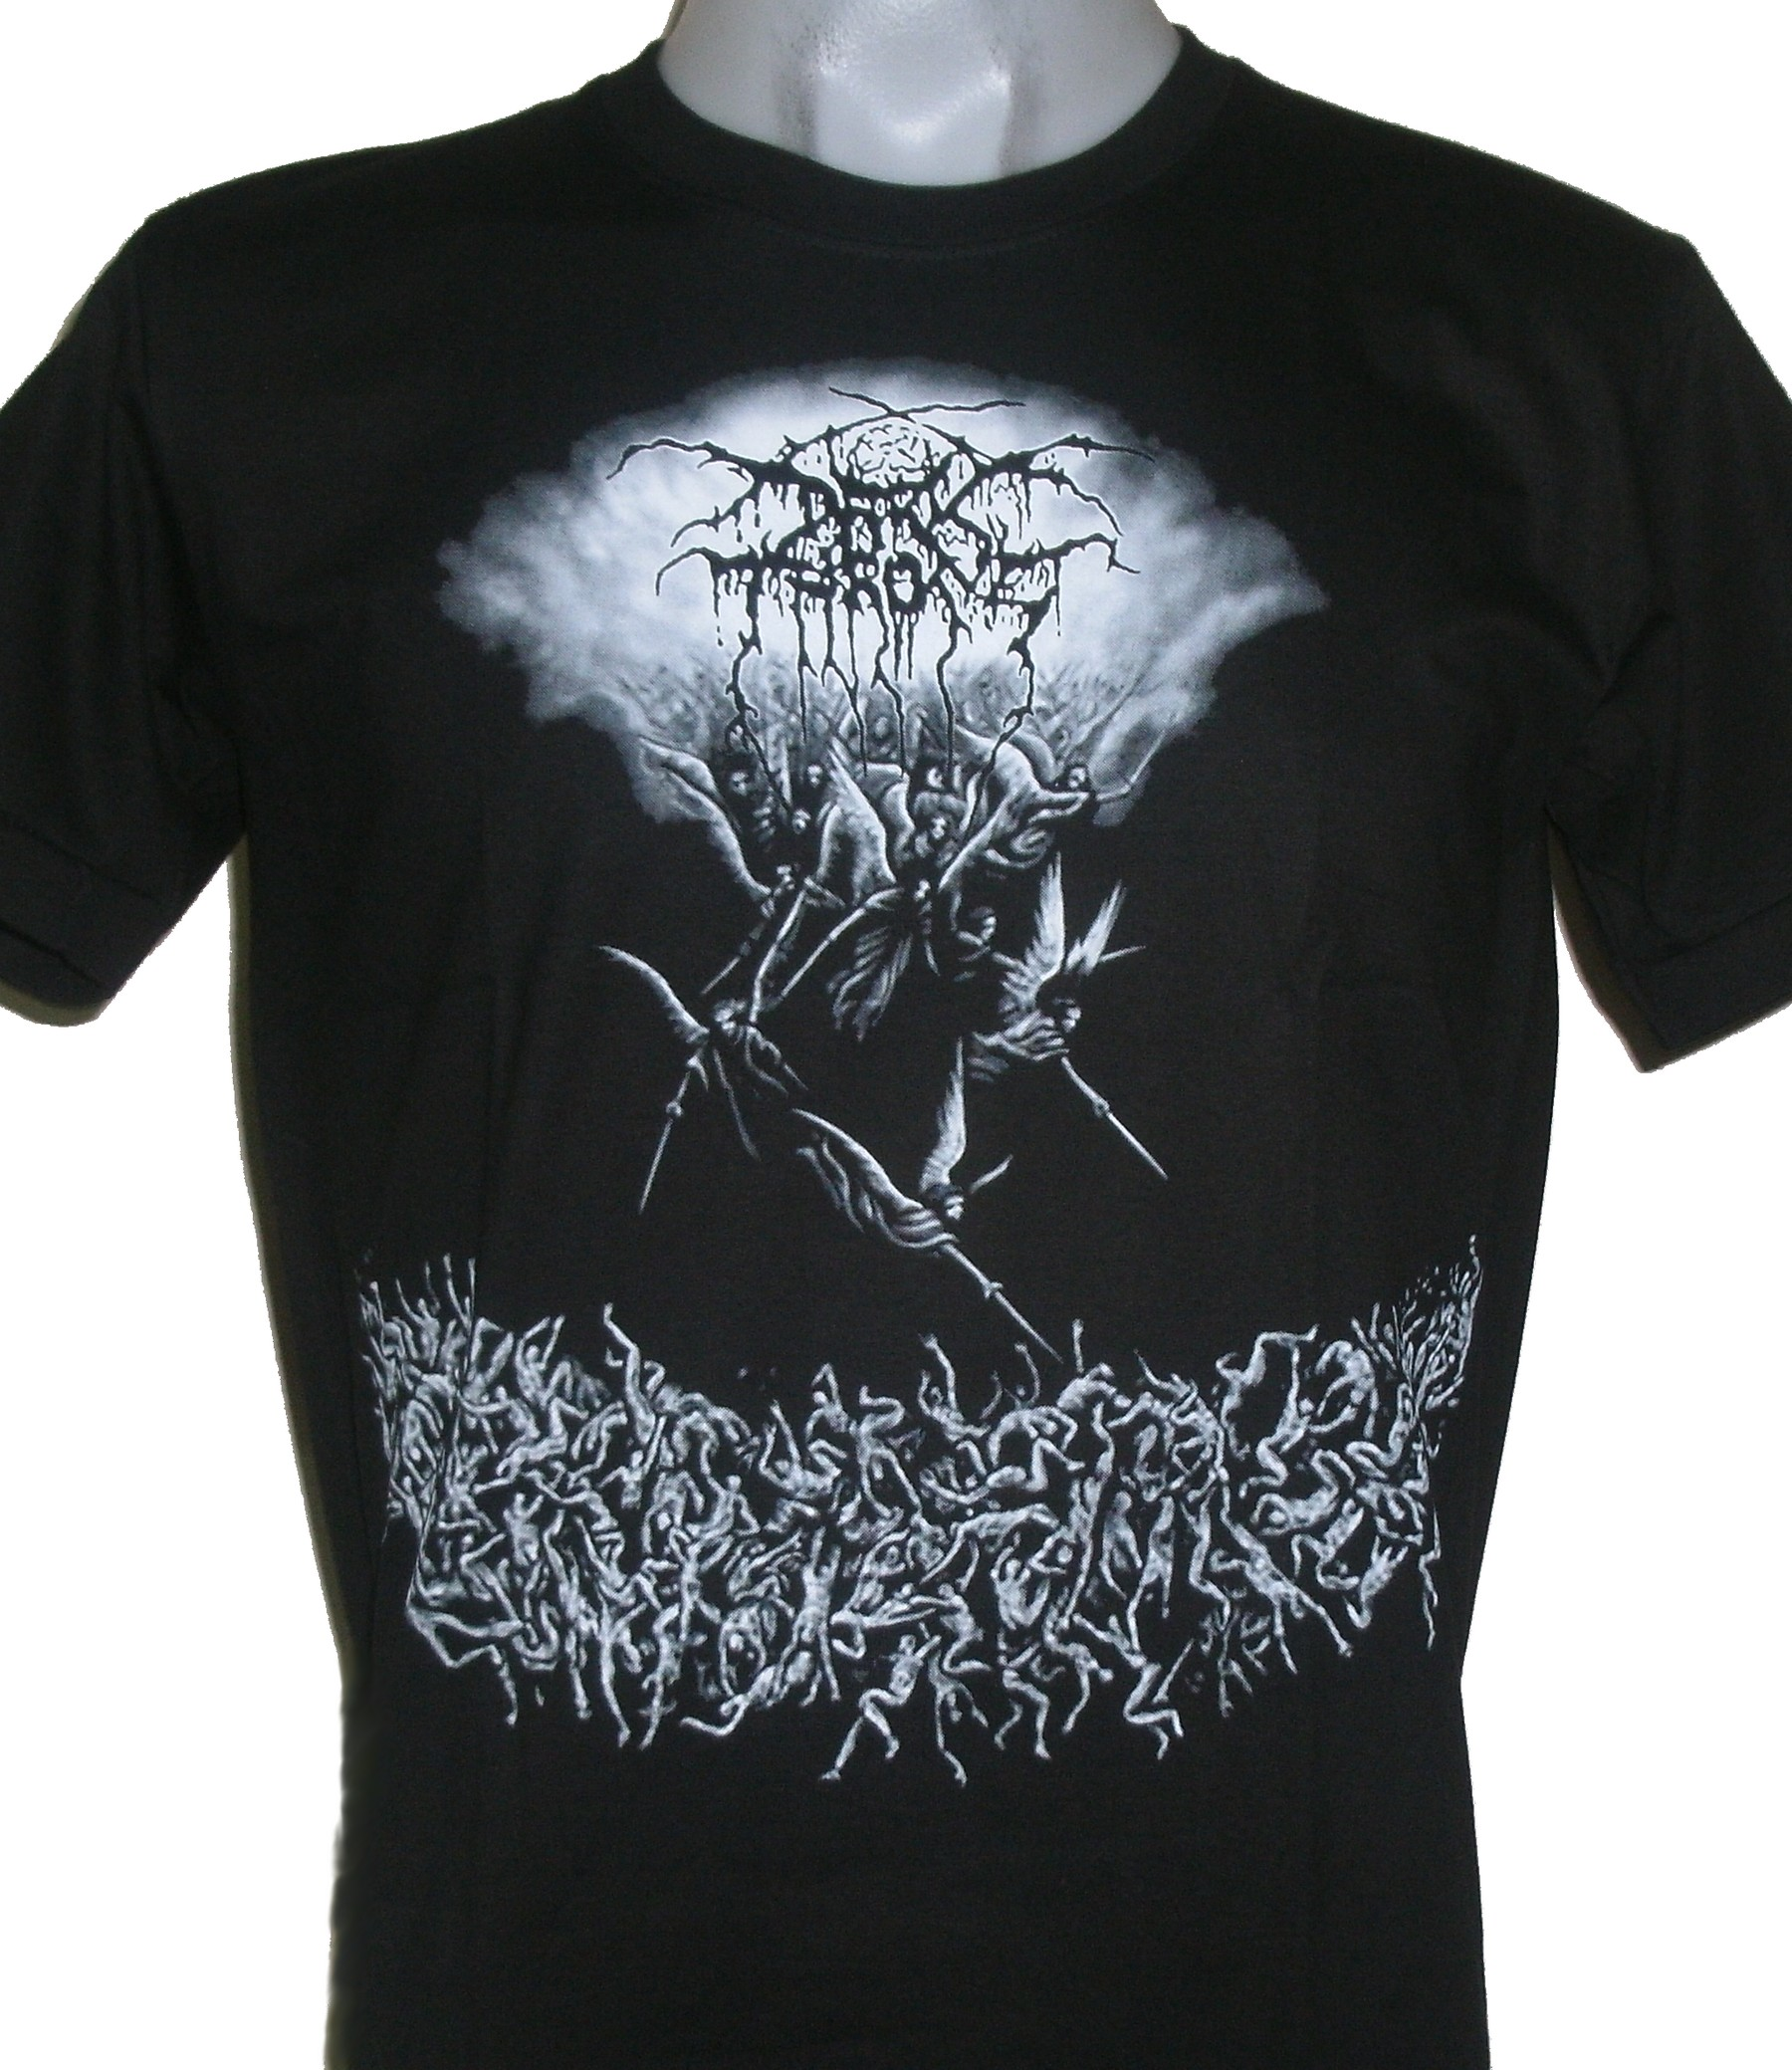 Darkthrone UNISEX Mens LONG SLEEVE Black Rock Shirt NEW Sizes S-3XL